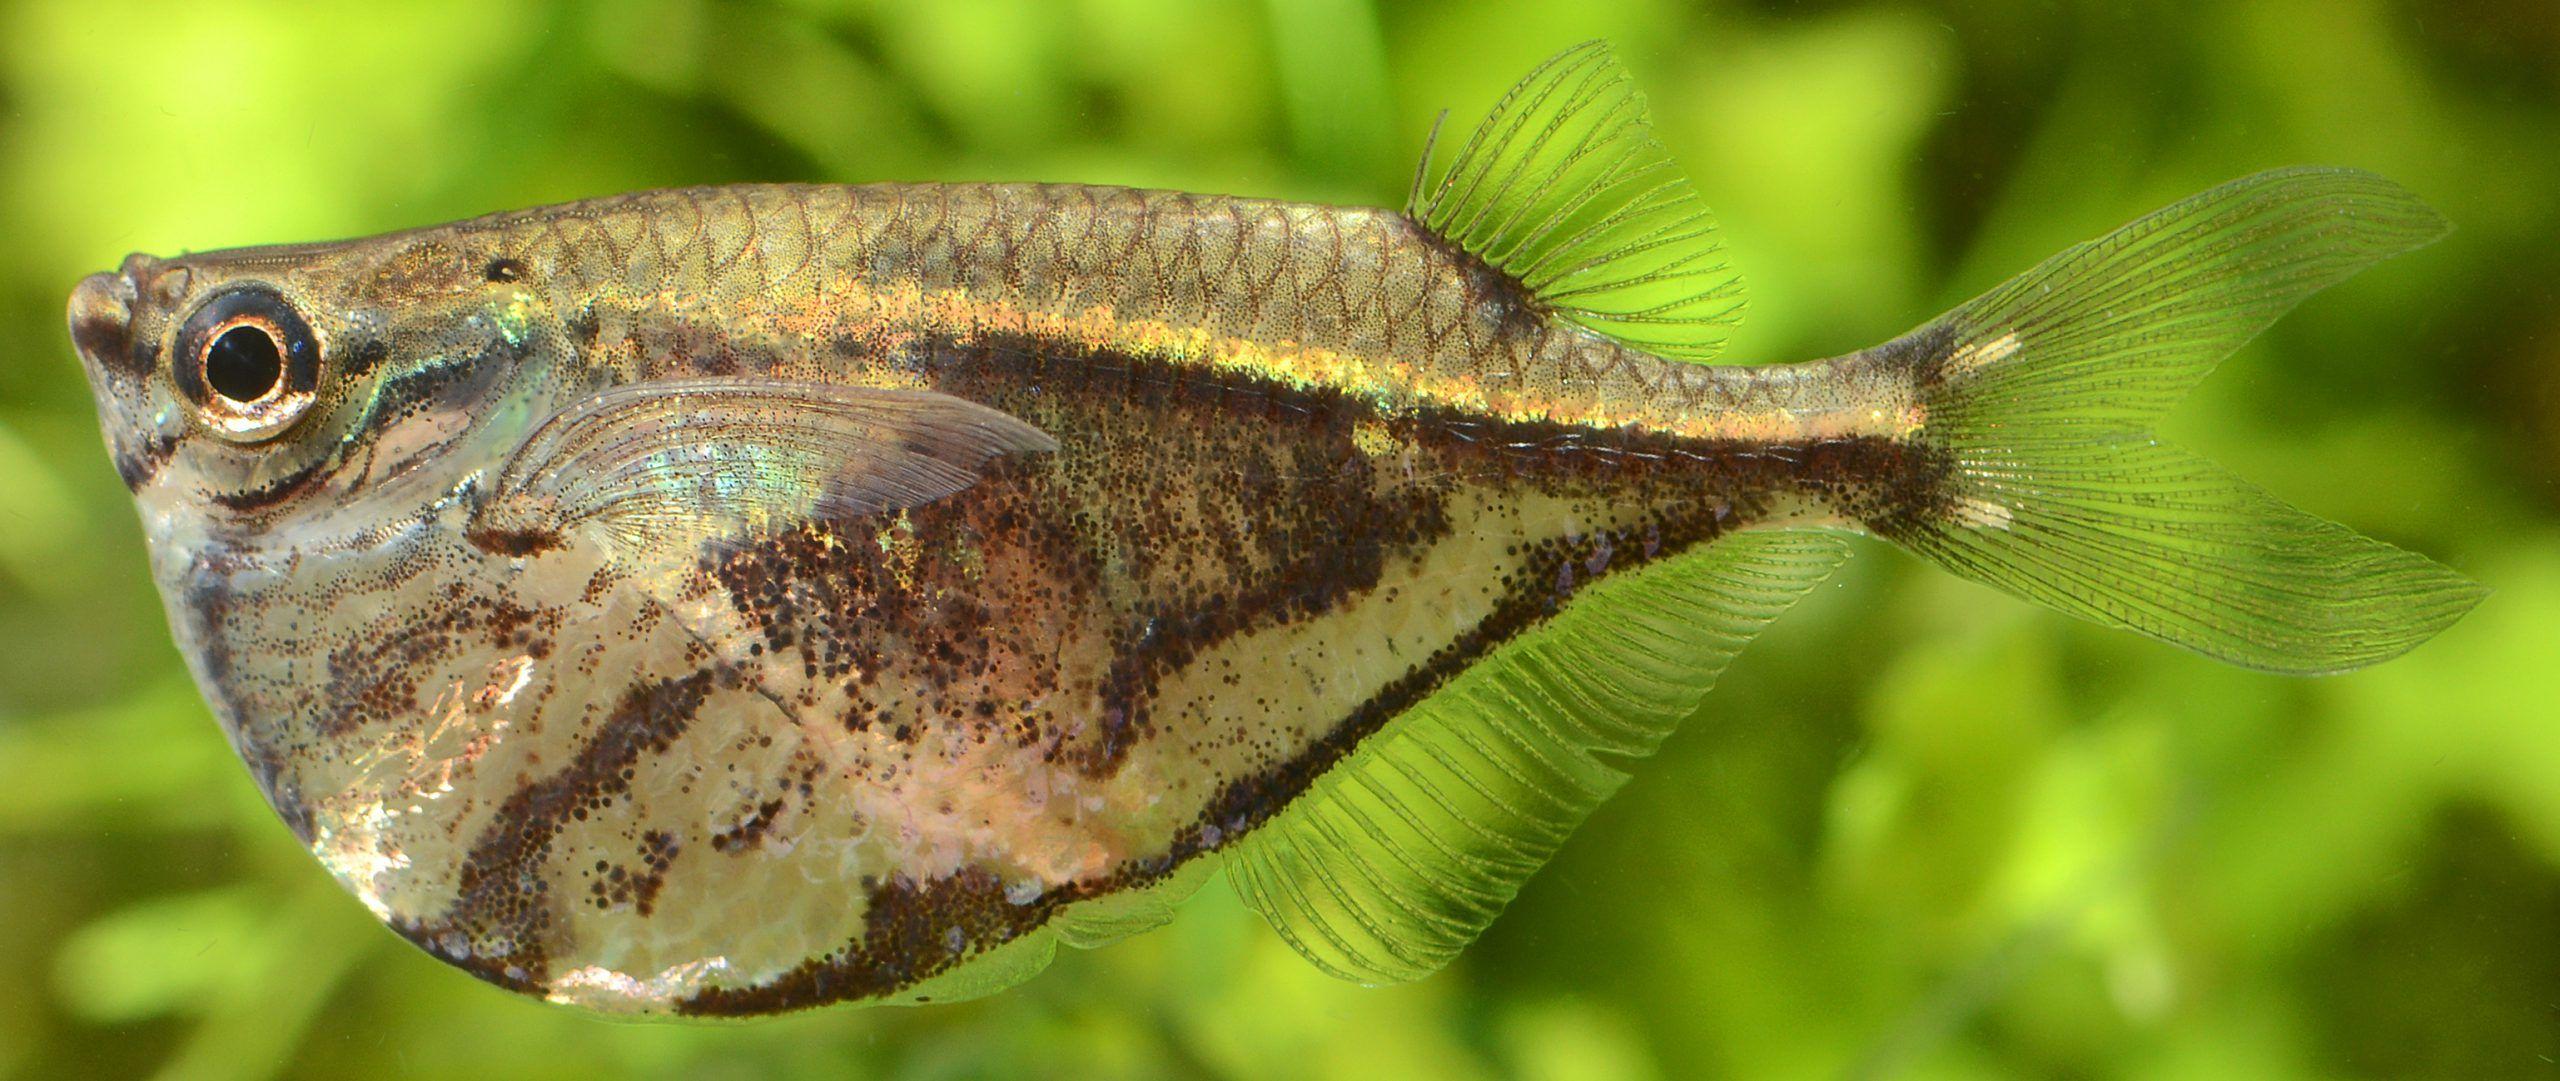 pez hacha marmol